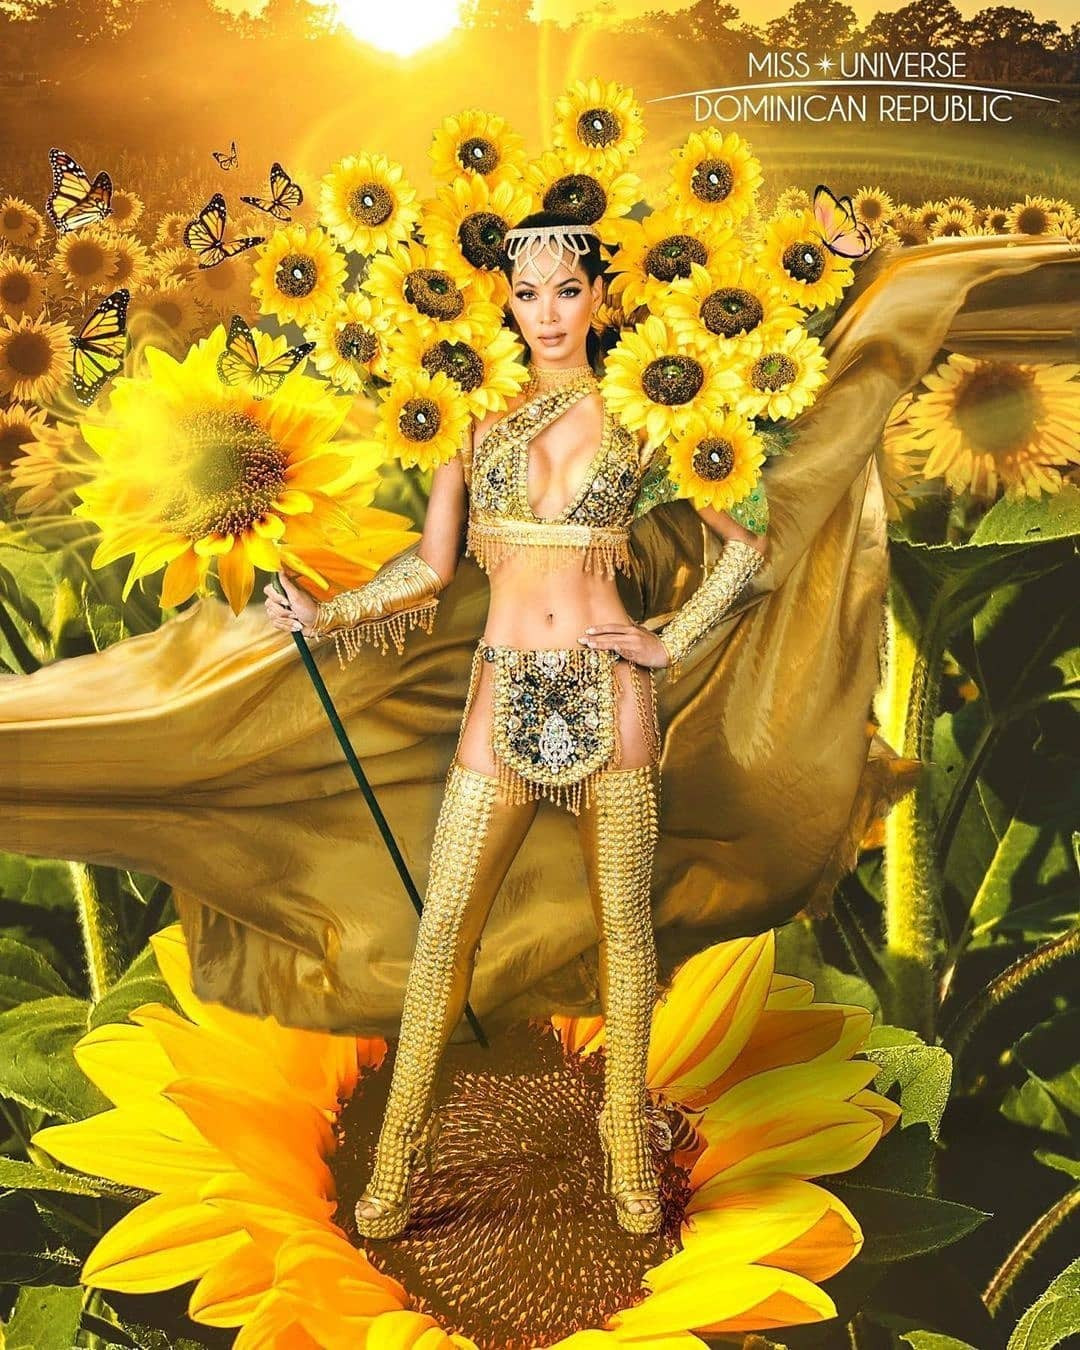 trajes tipicos de candidatas a 69ᵗʰ miss universe. - Página 2 B2iUbV